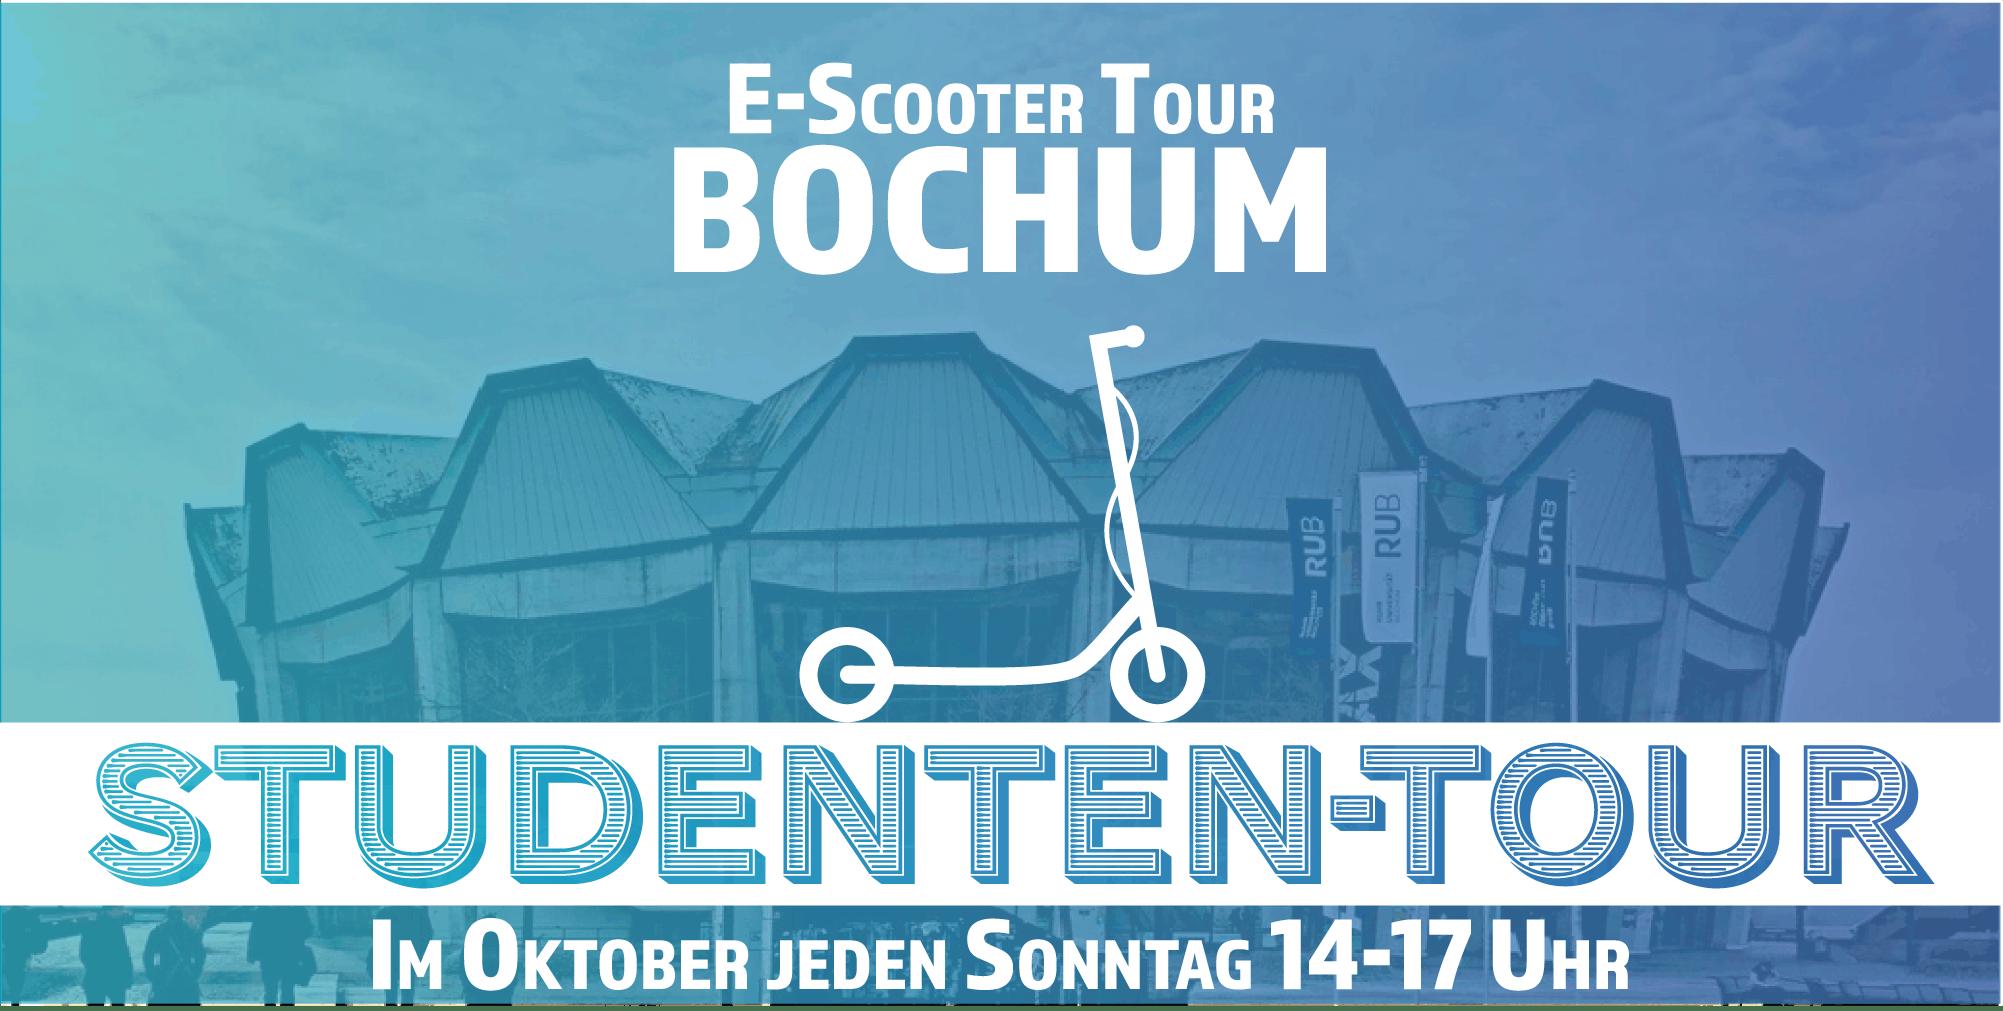 E-Scooter Studenten-Tour Bochum